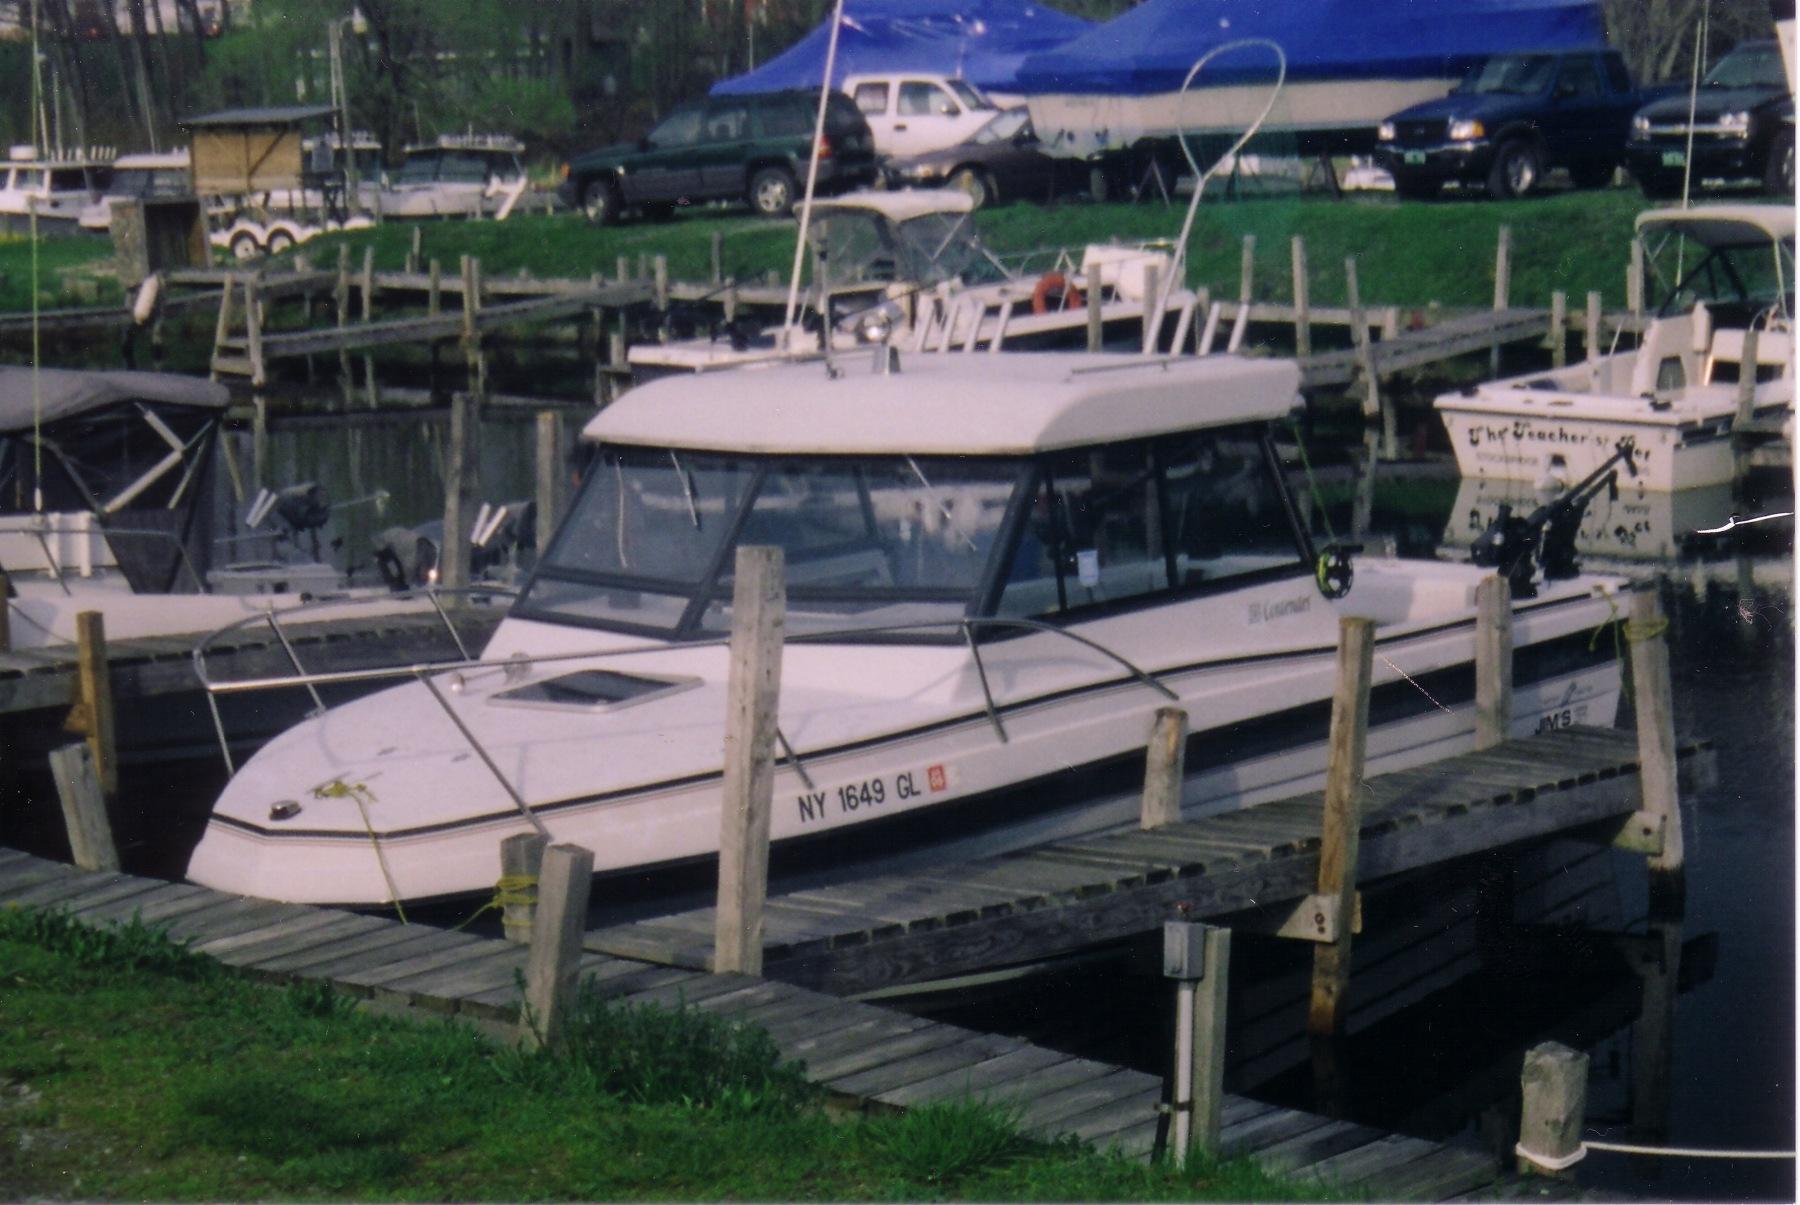 Copy of The boat002.jpg